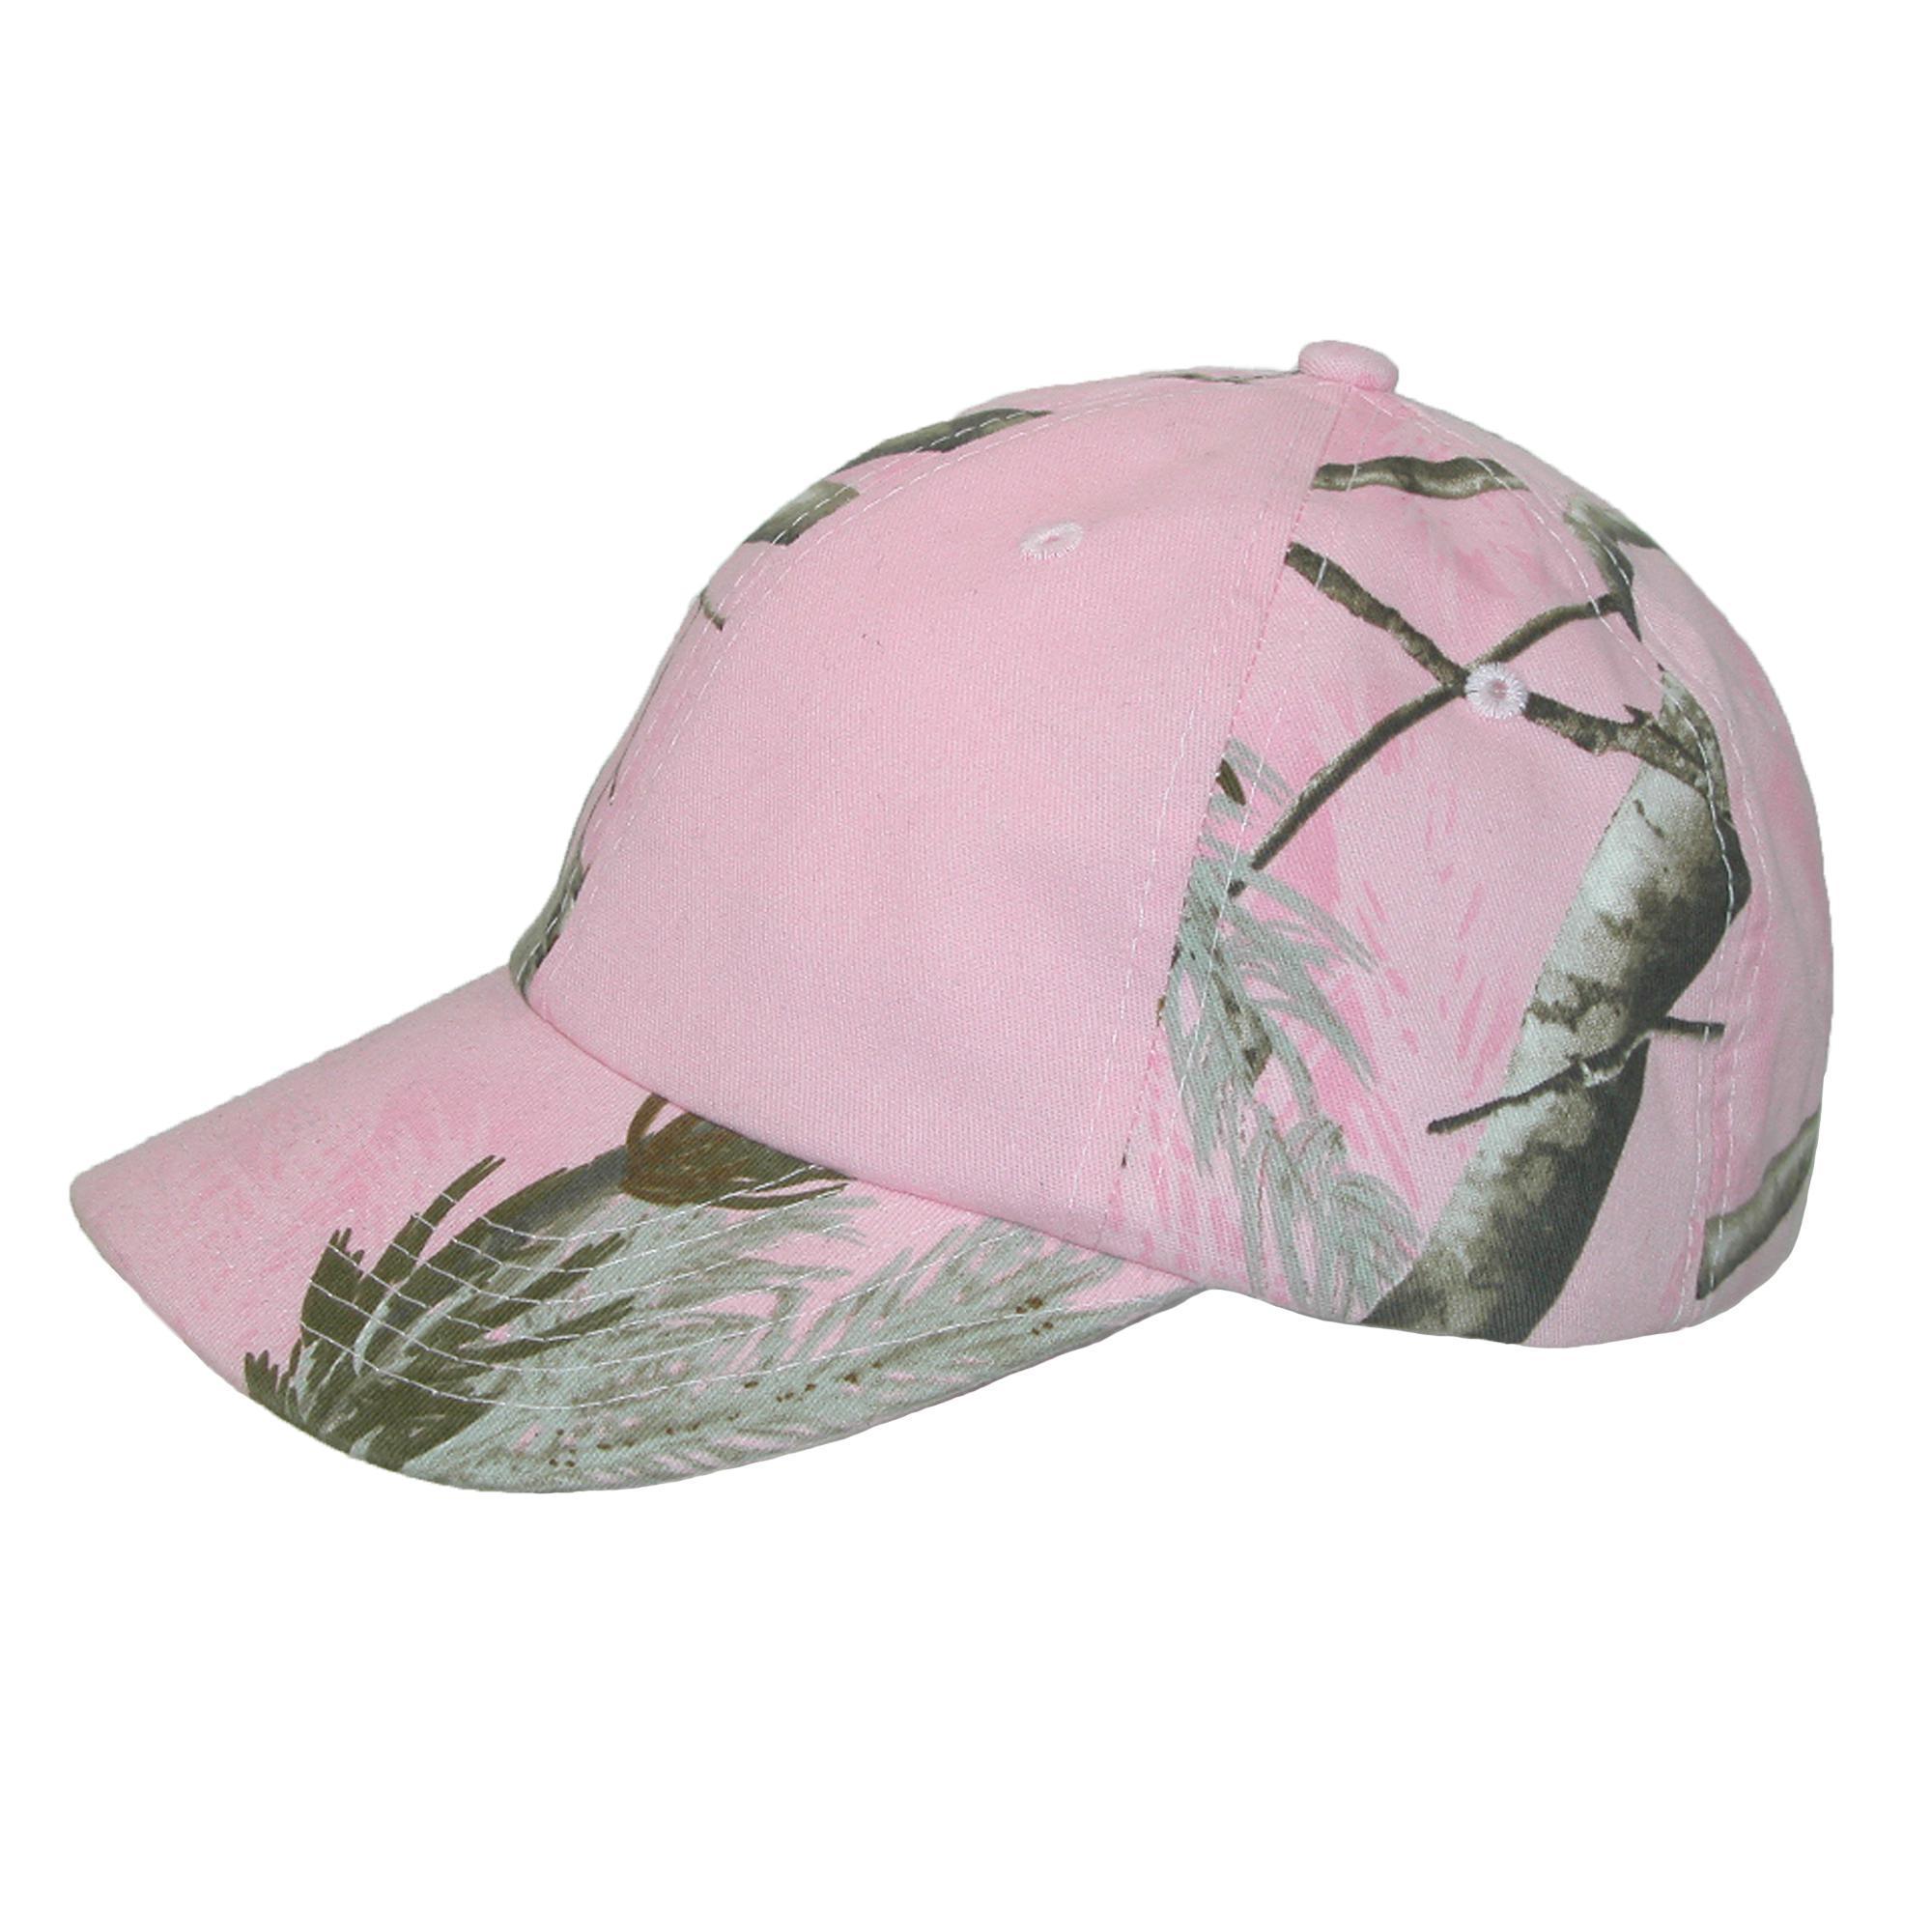 49e6bb153b0 New CTM Women s Kati Treestand Pink Camo Baseball Hat 847164082257 ...